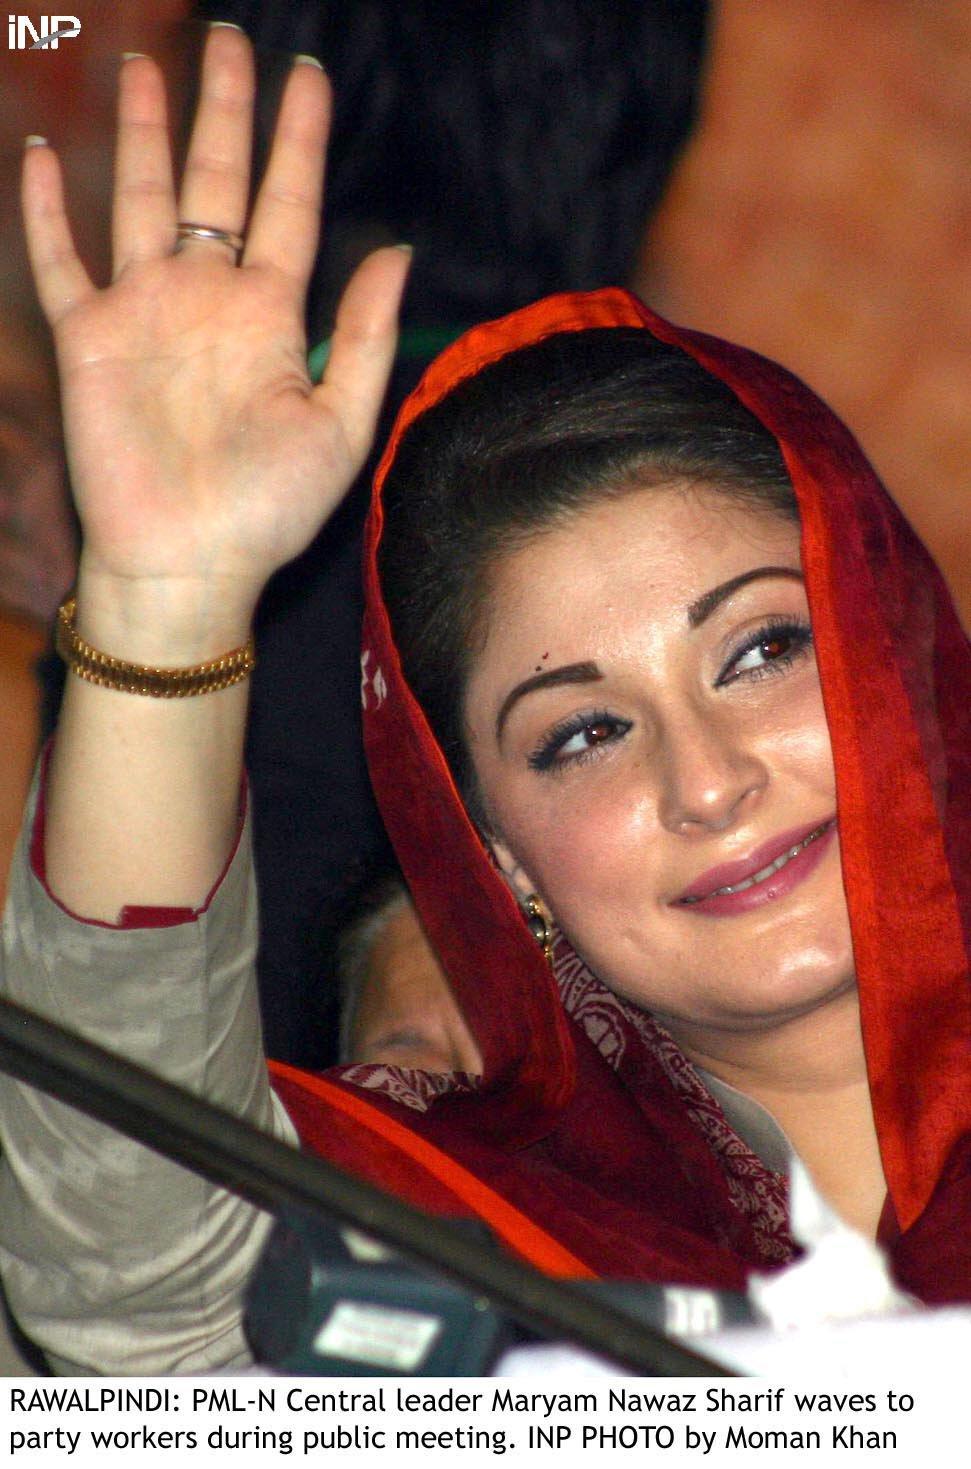 prime minister nawaz sharif 039 s daughter maryam nawaz photo inp file